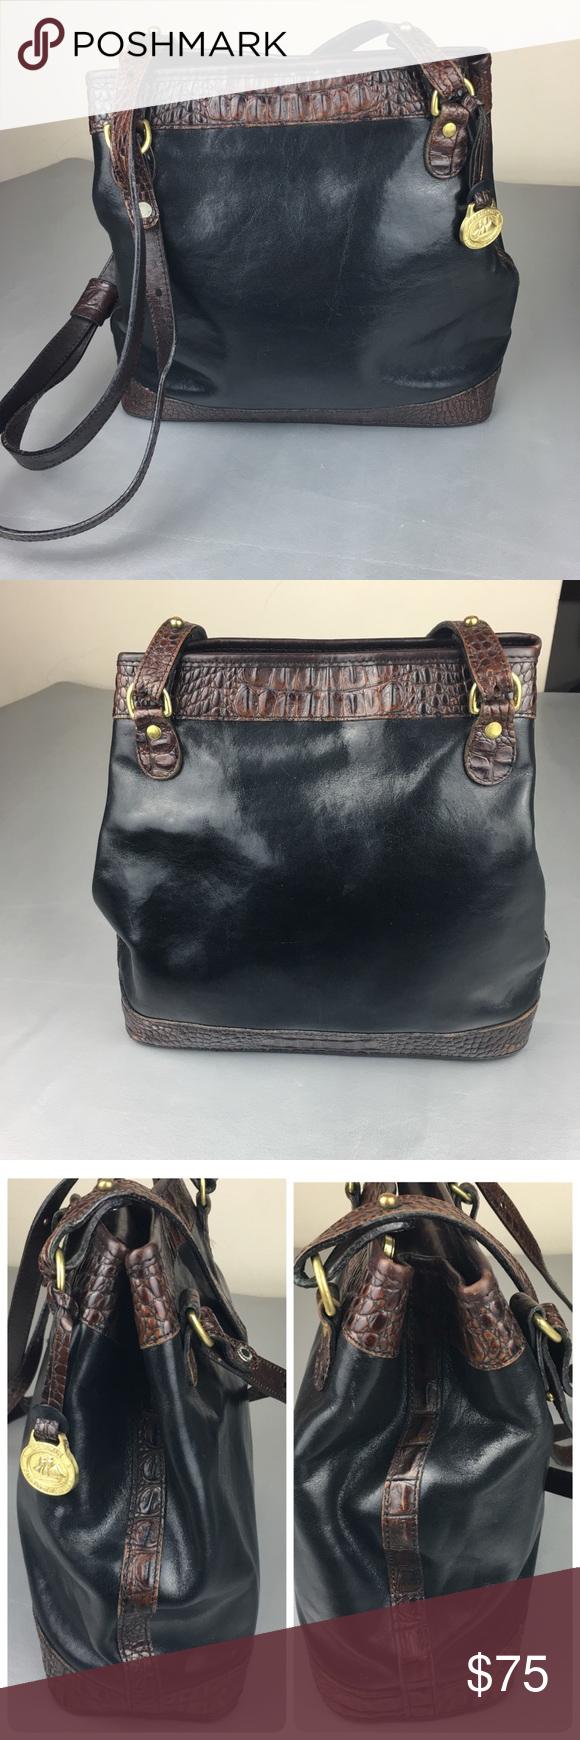 4c148c35882e Vintage Brahmin black leather bucket bag Vintage Authentic Brahmin black  leather bucket bag. Has brown